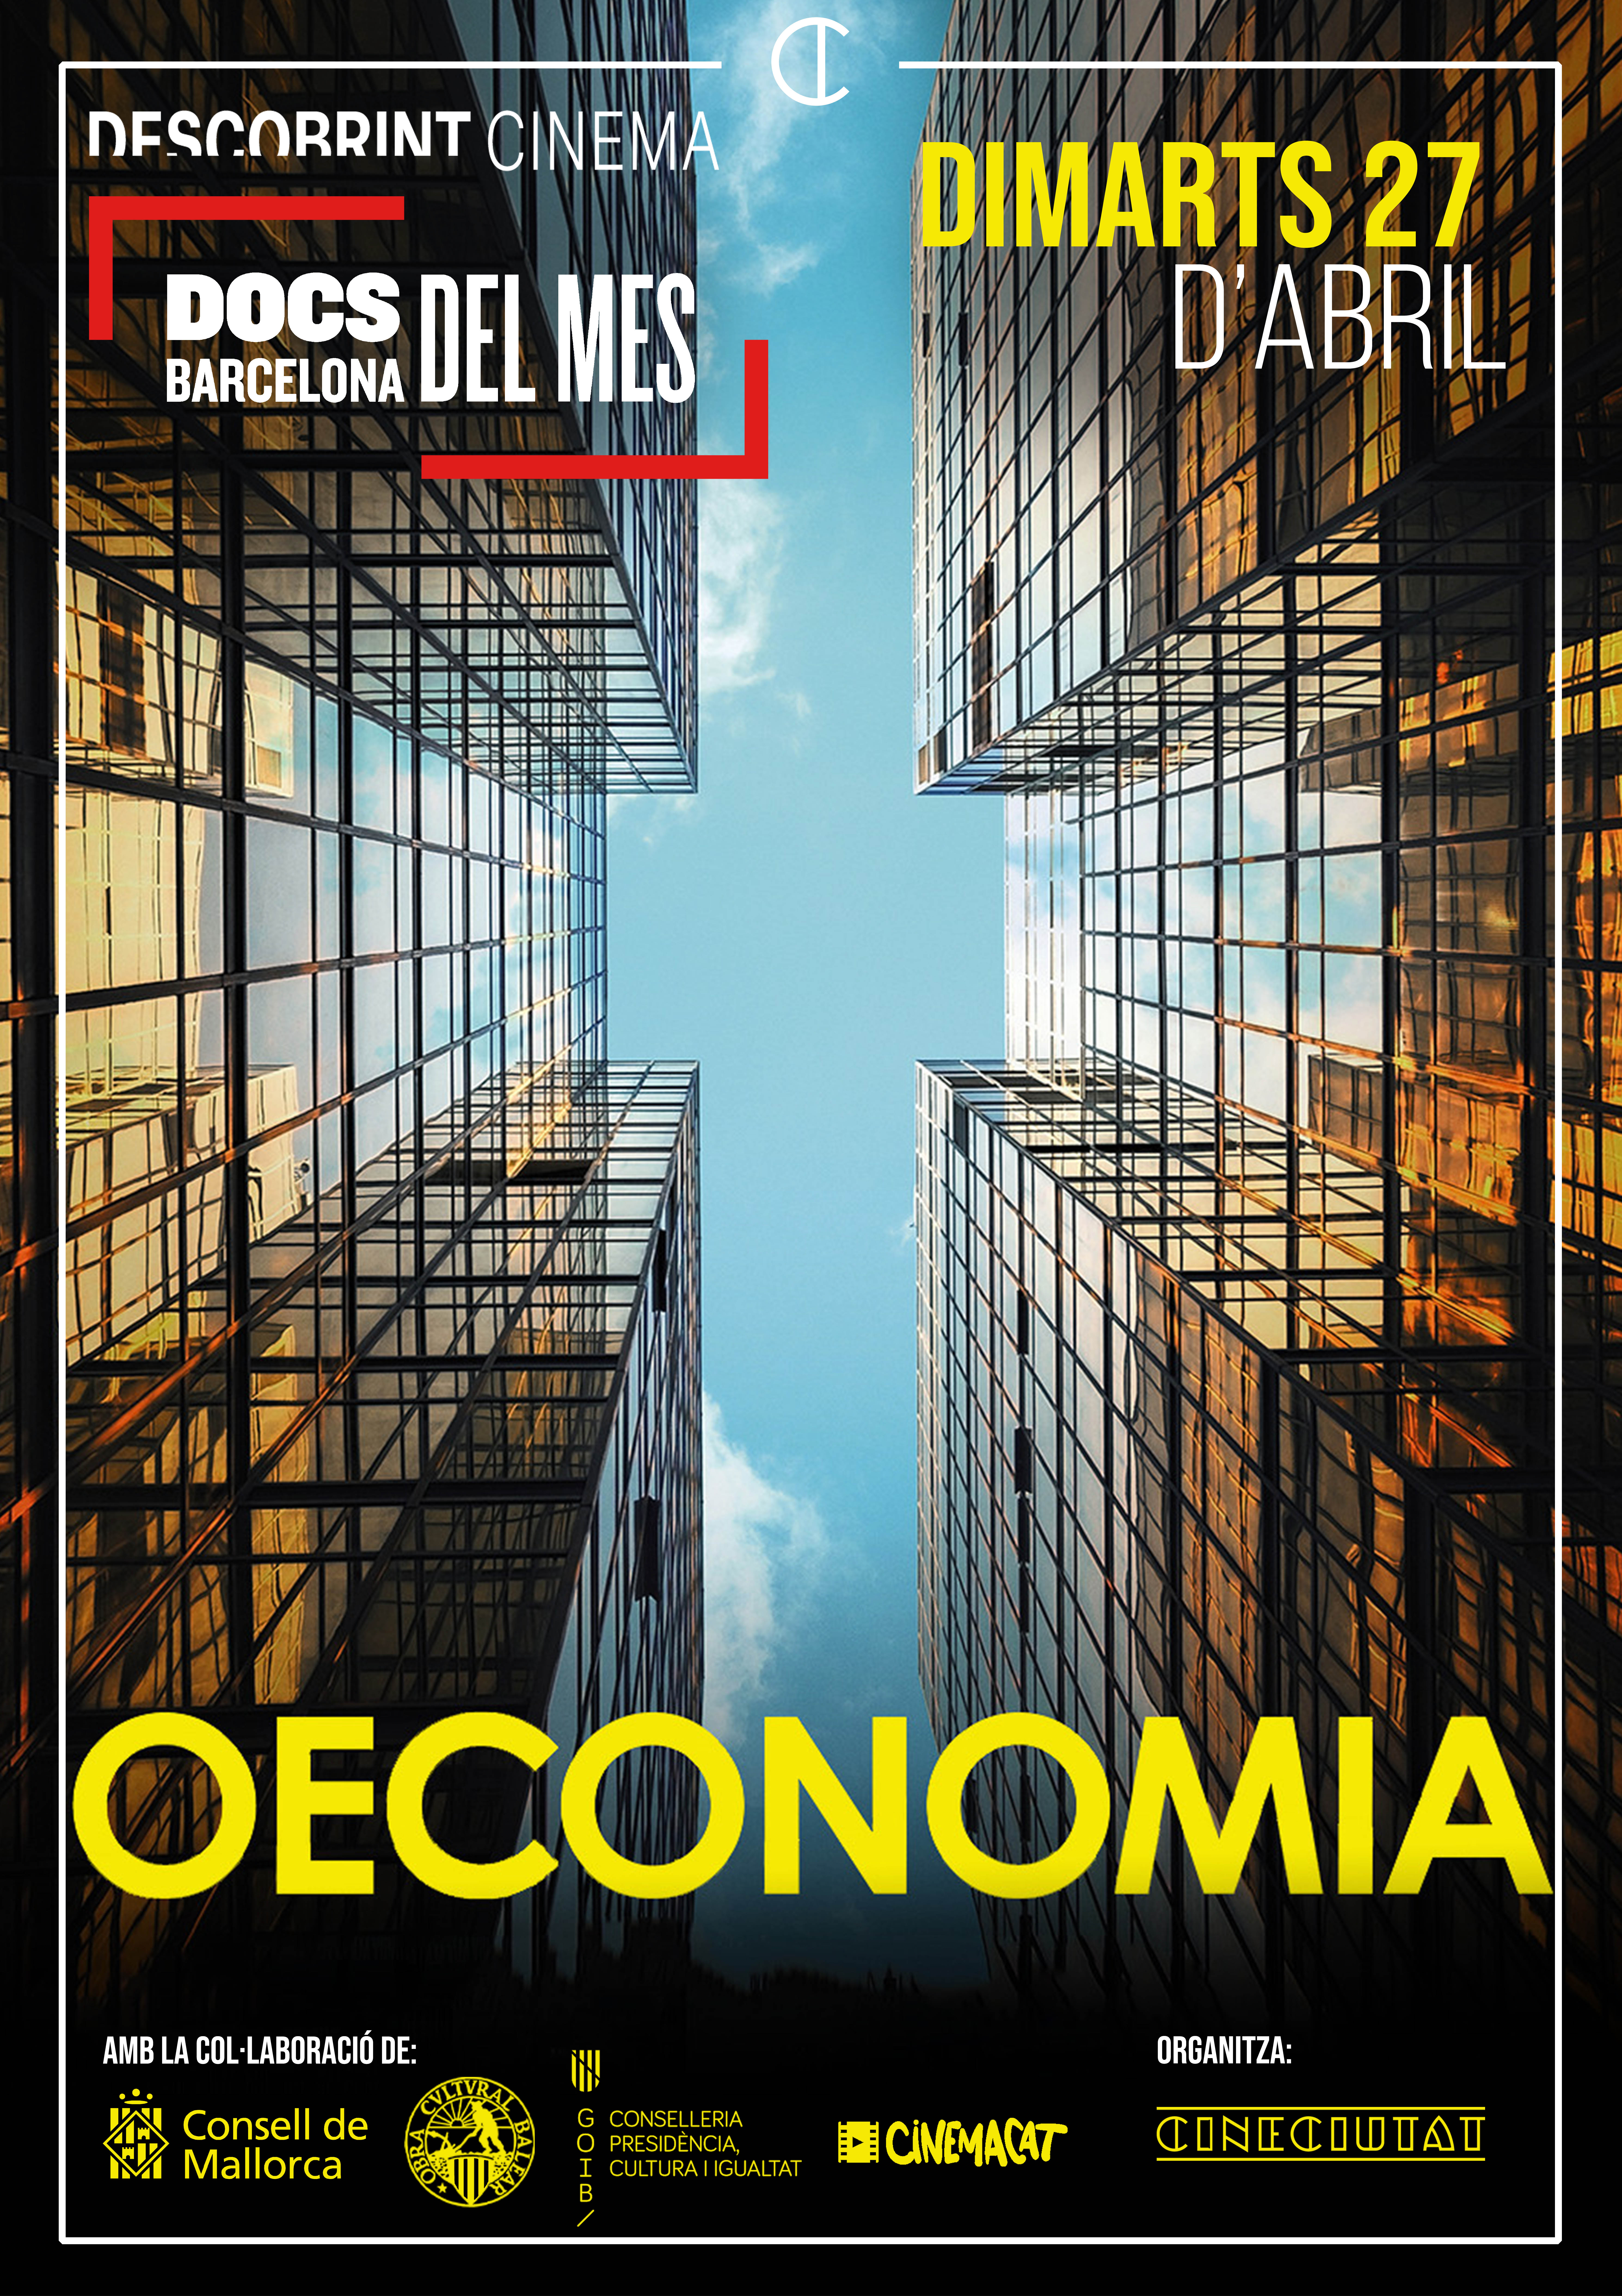 DocDelMes_Oeconomia_27Abril_v1_SinHora.jpg